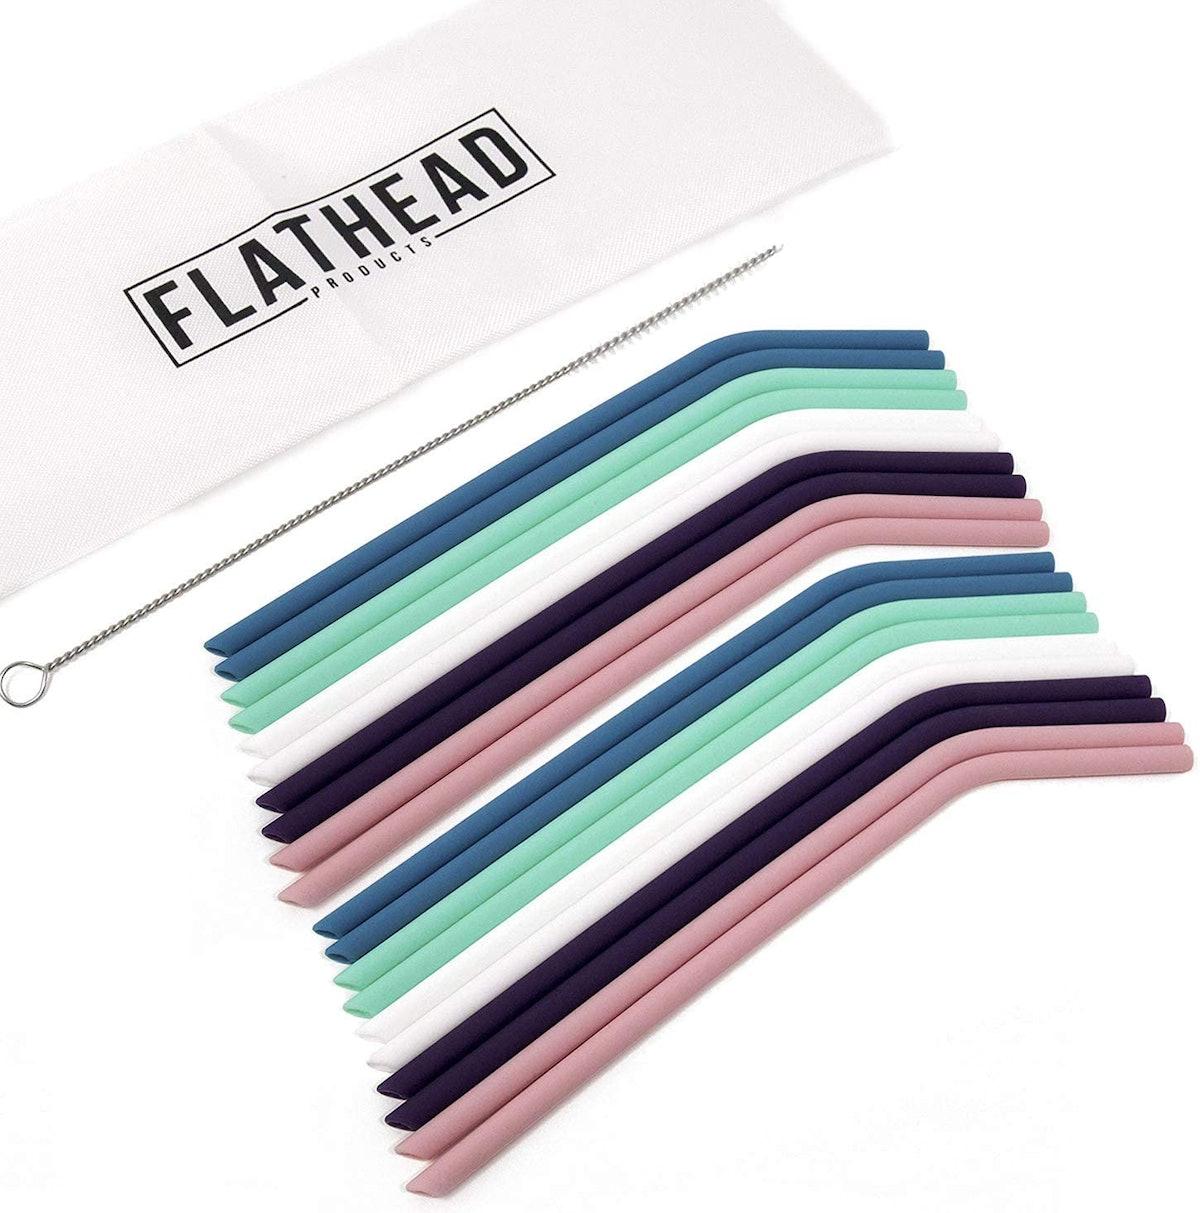 Flathead Reusable Silicone Straws (20-Pack)